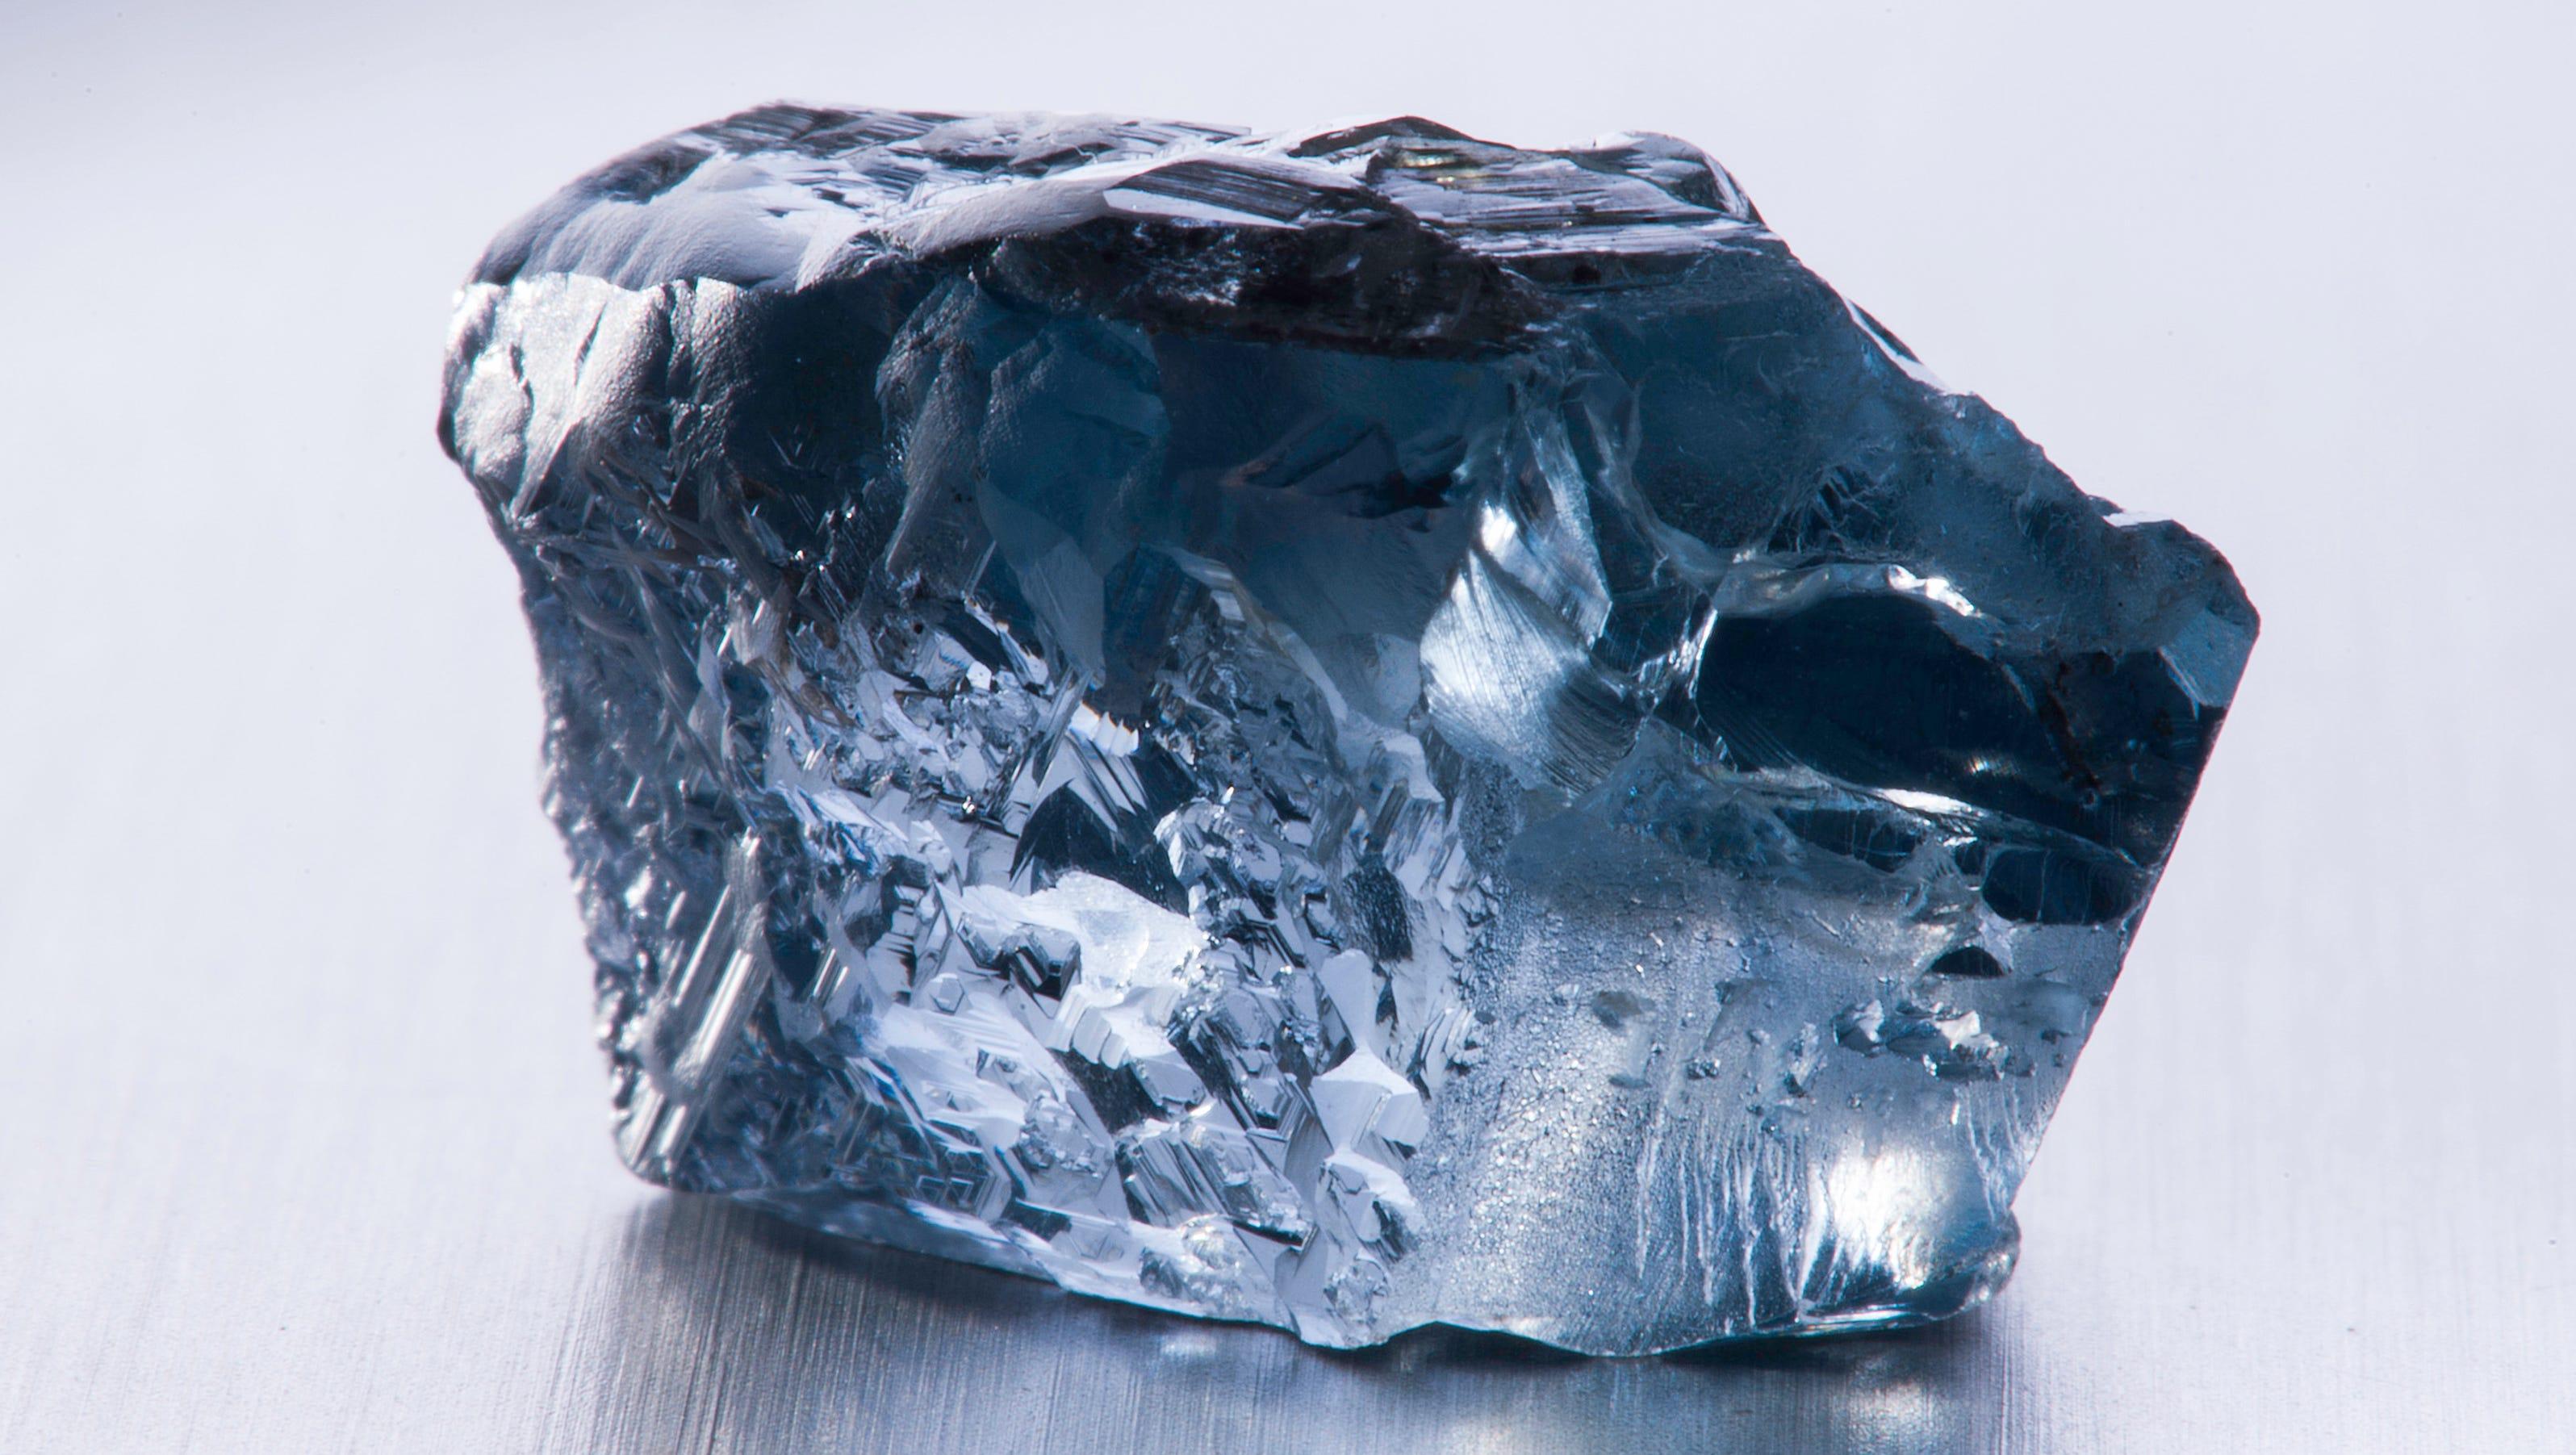 Rare Blue Diamond Found In South Africa